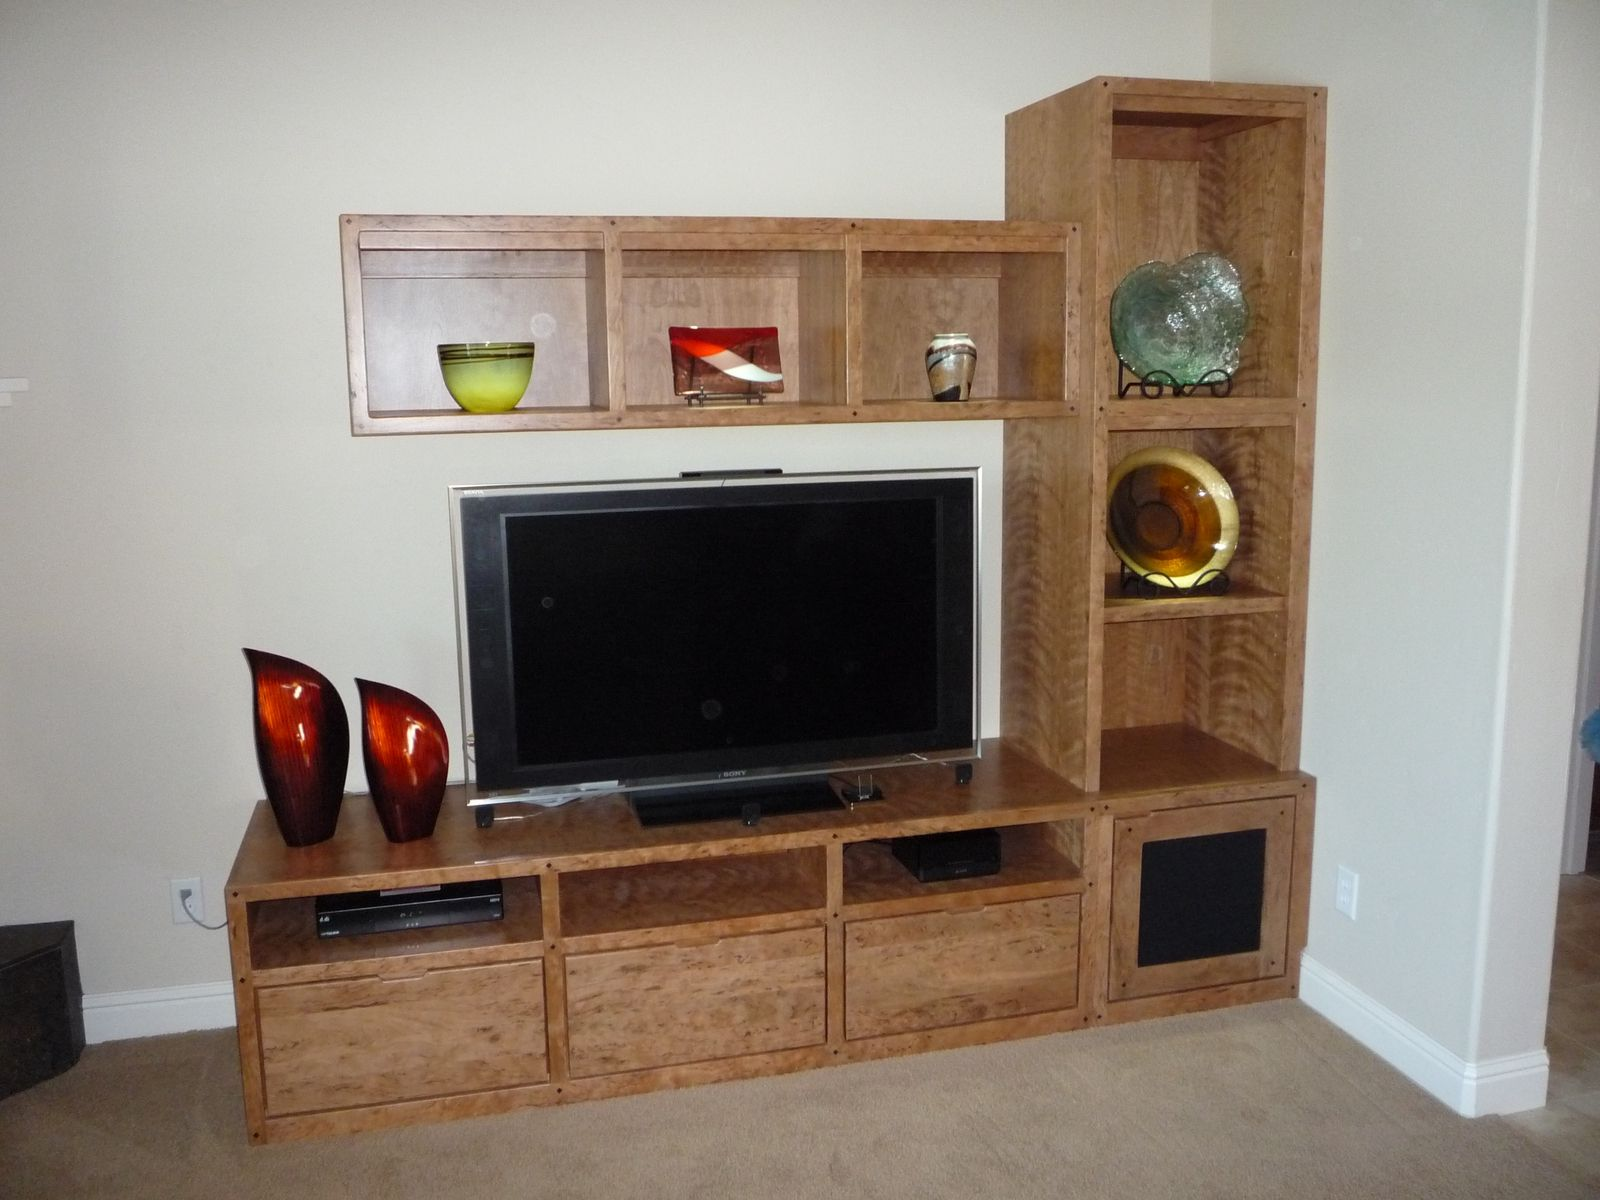 Custom made custom cherry entertainment center for the home